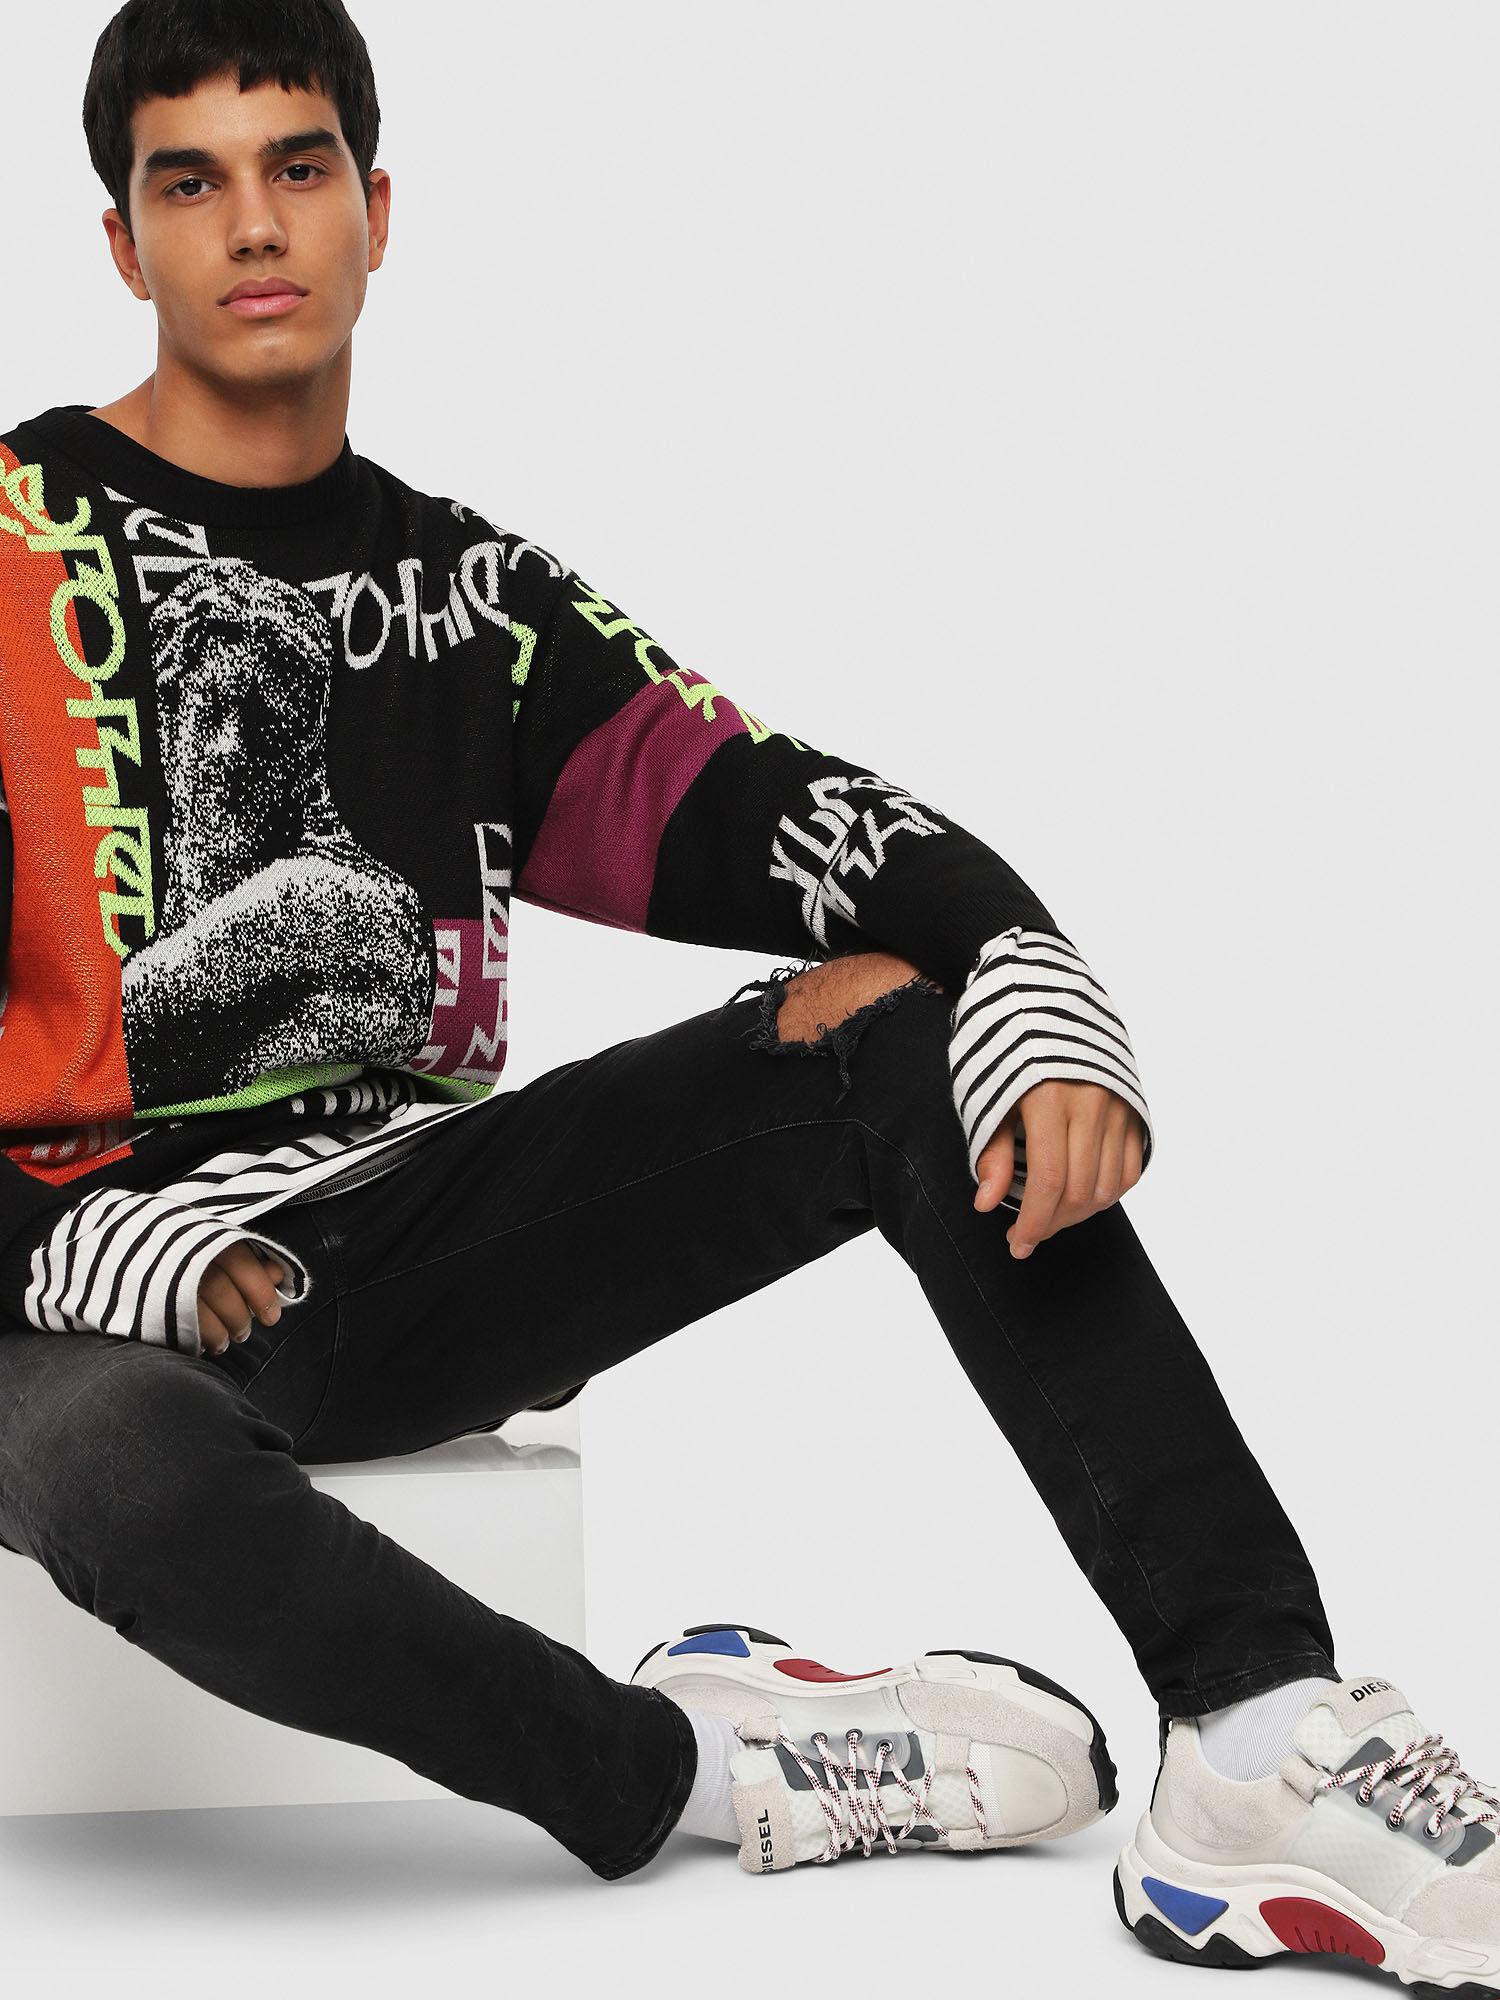 S-KIPPER LOW LACE Men: Low top sneakers